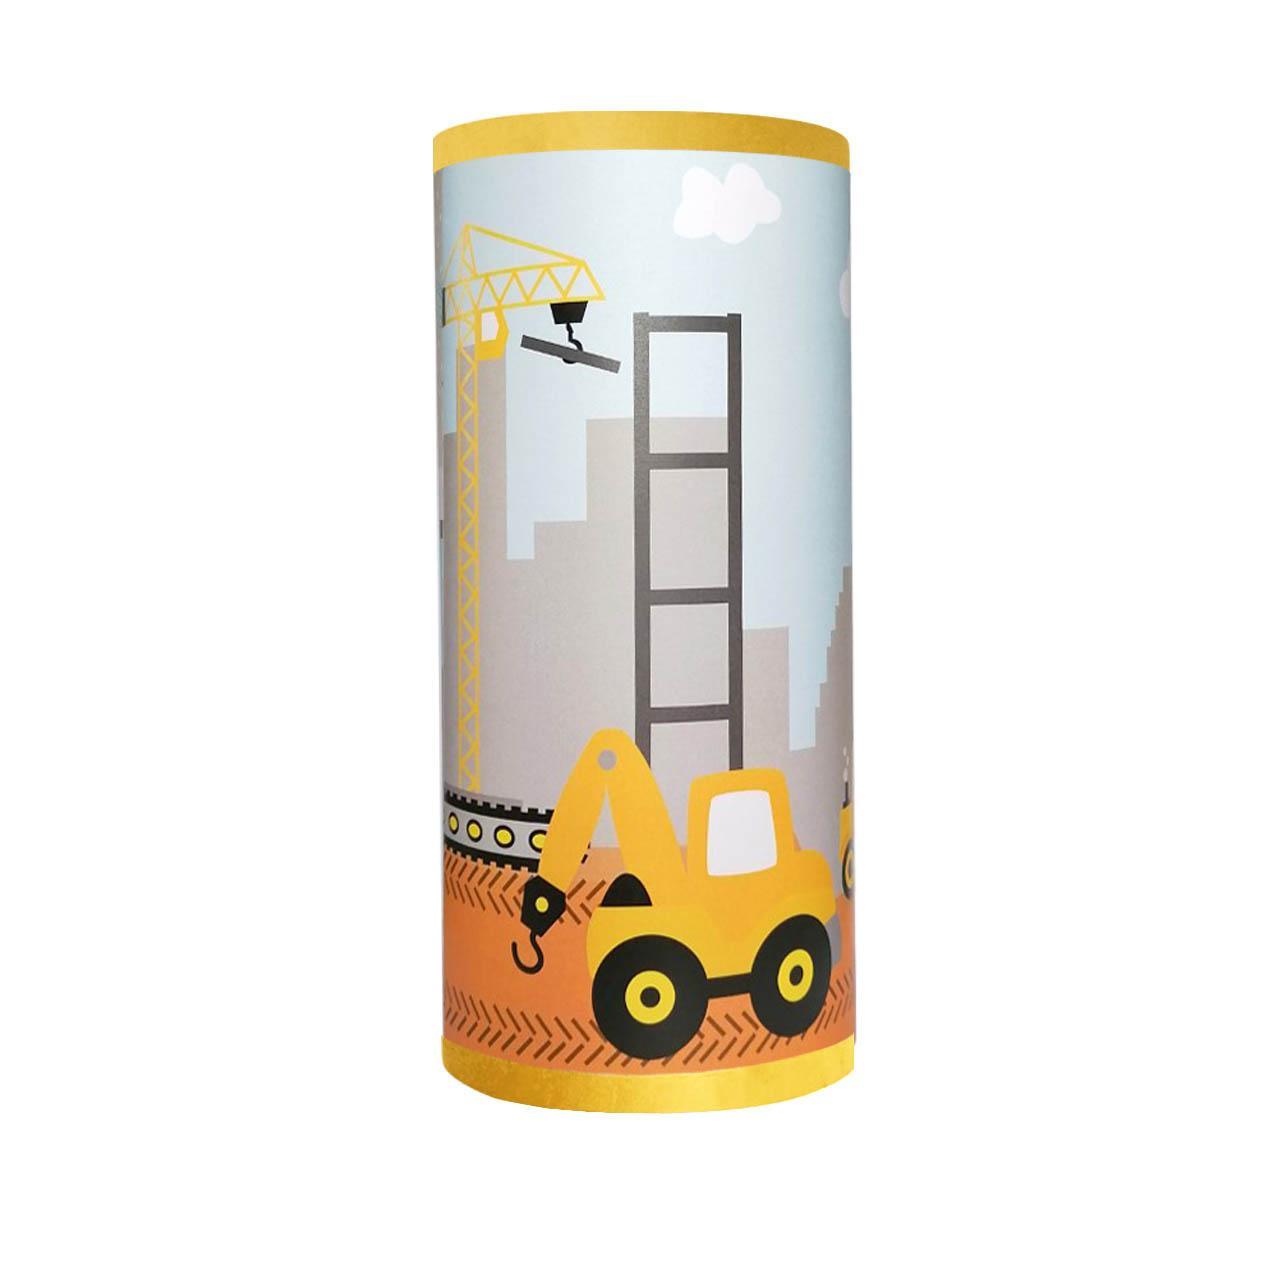 Chantier lampe tube